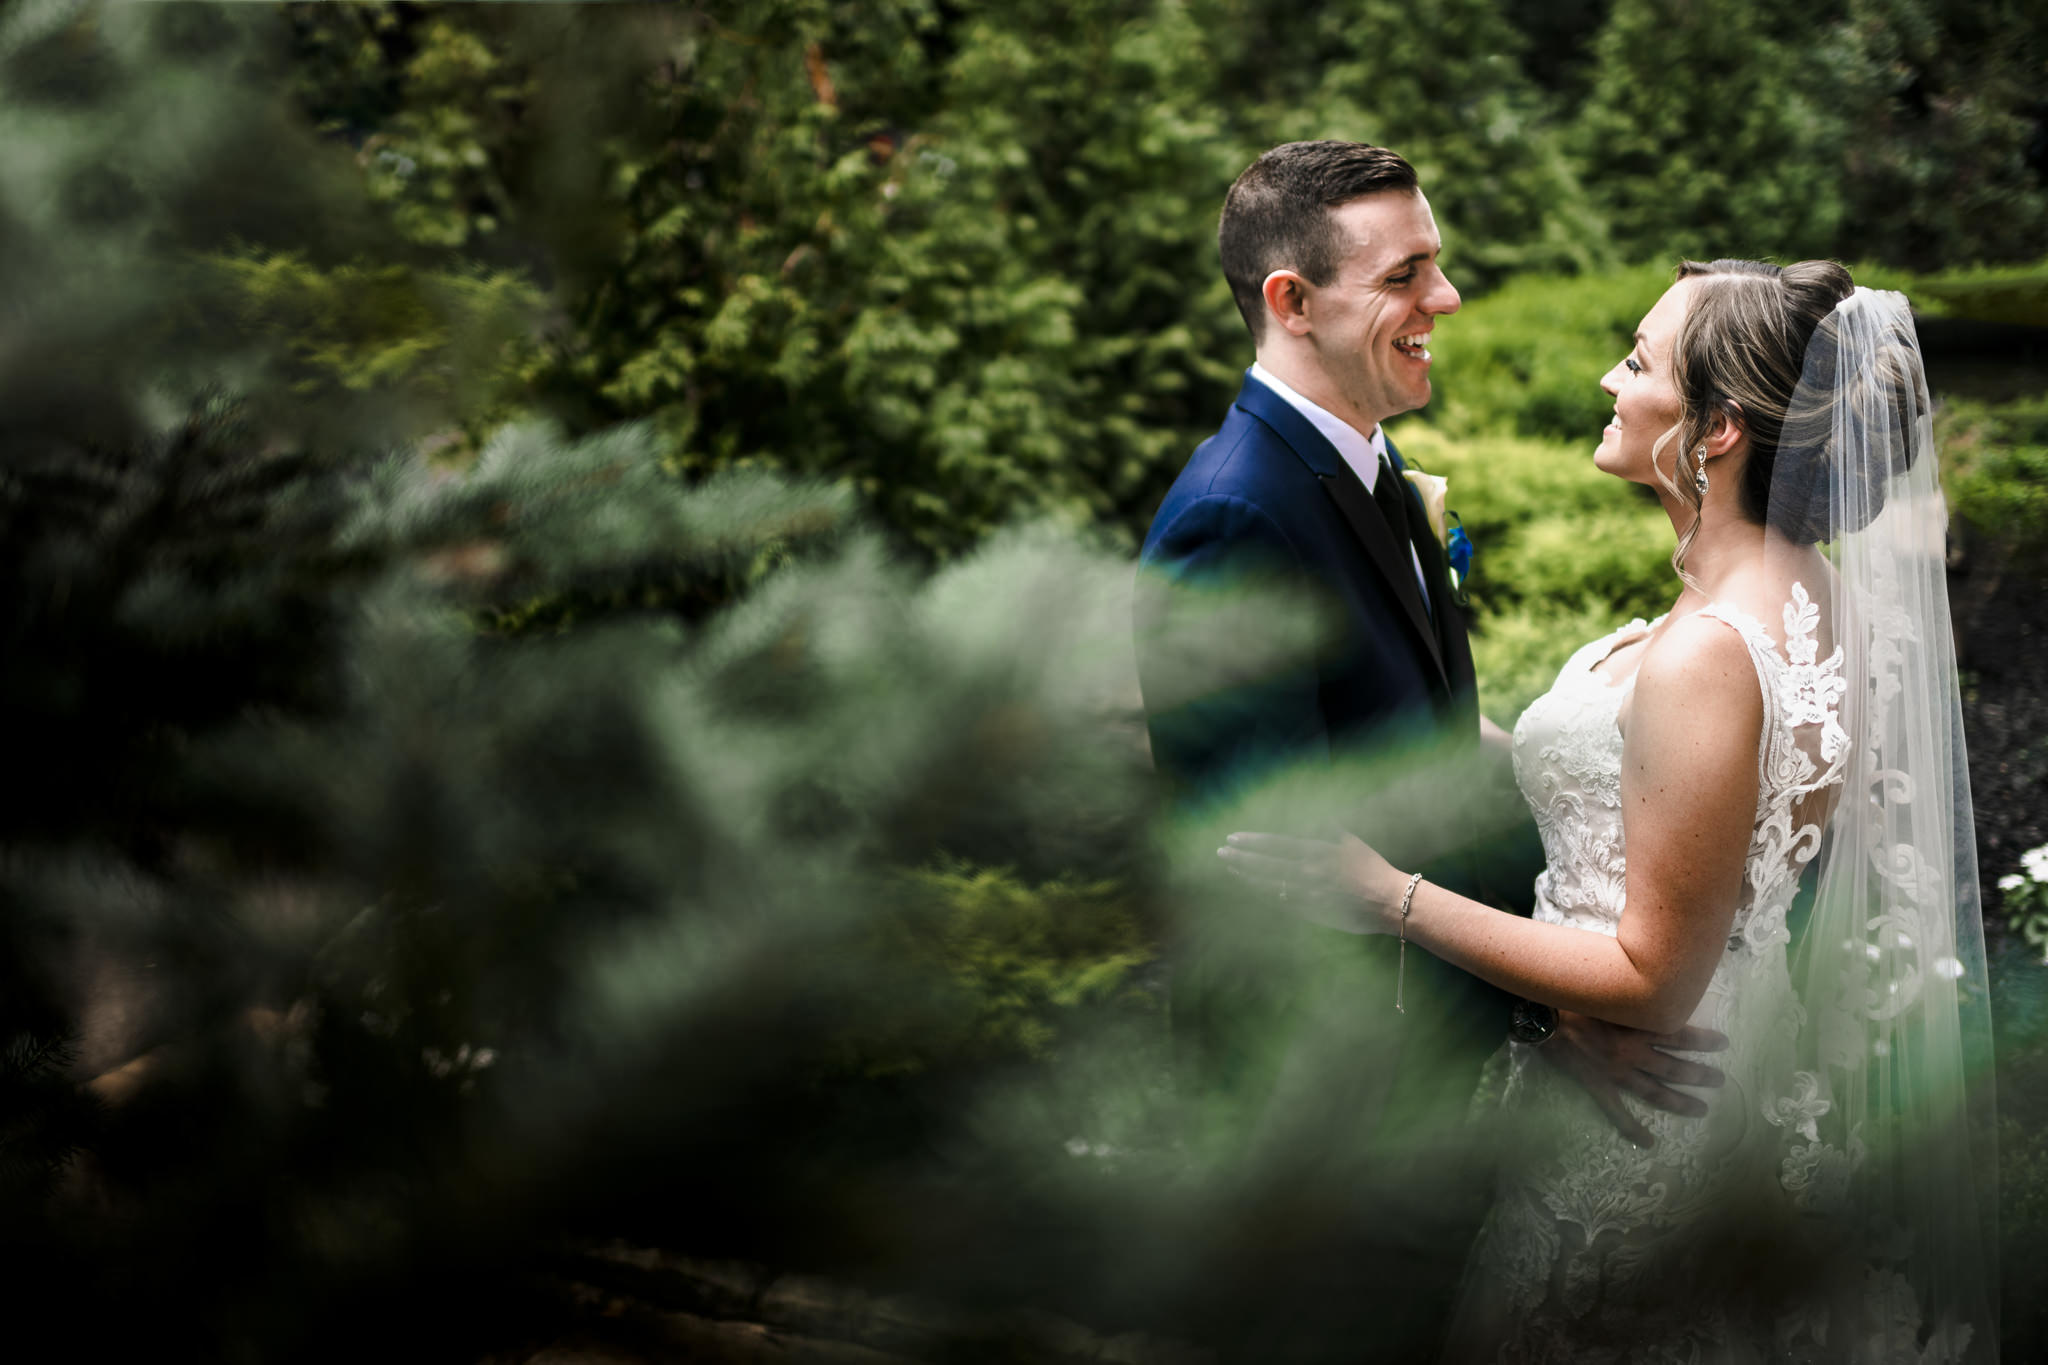 Brennan-South-Gate-Manor-New-Jersey-Wedding-Photographer-11.JPG